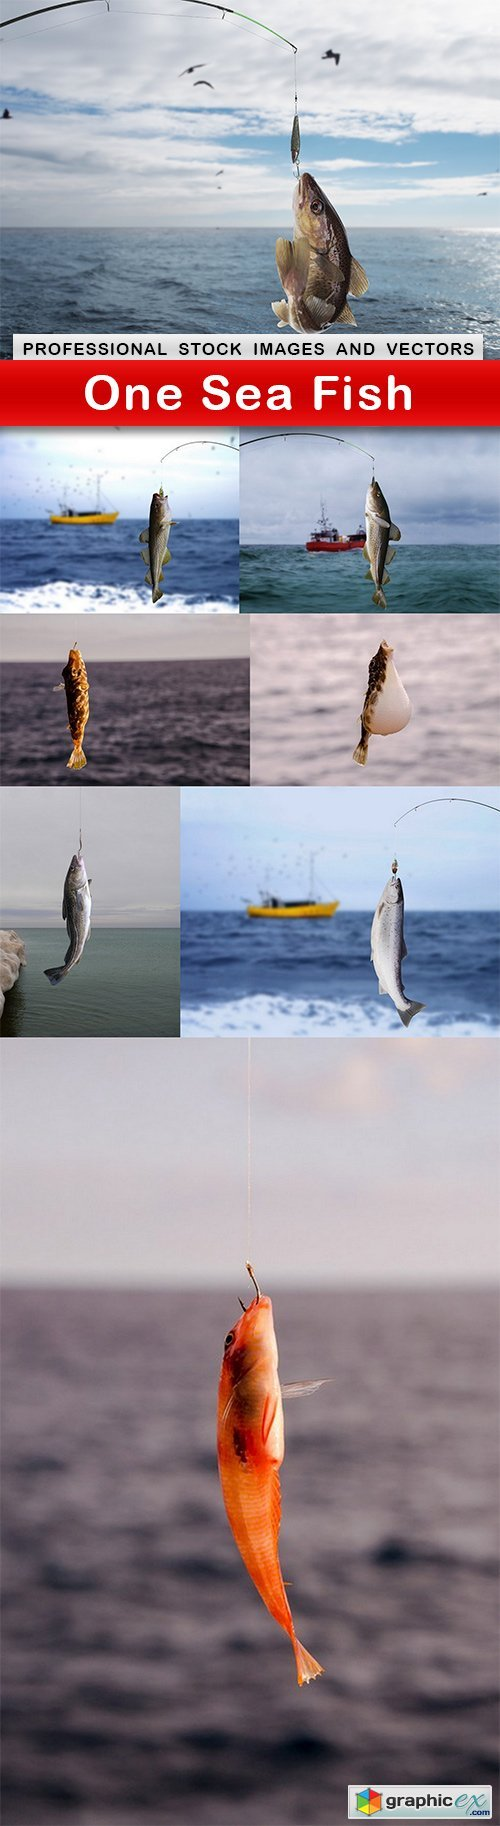 One Sea Fish - 8 UHQ JPEG